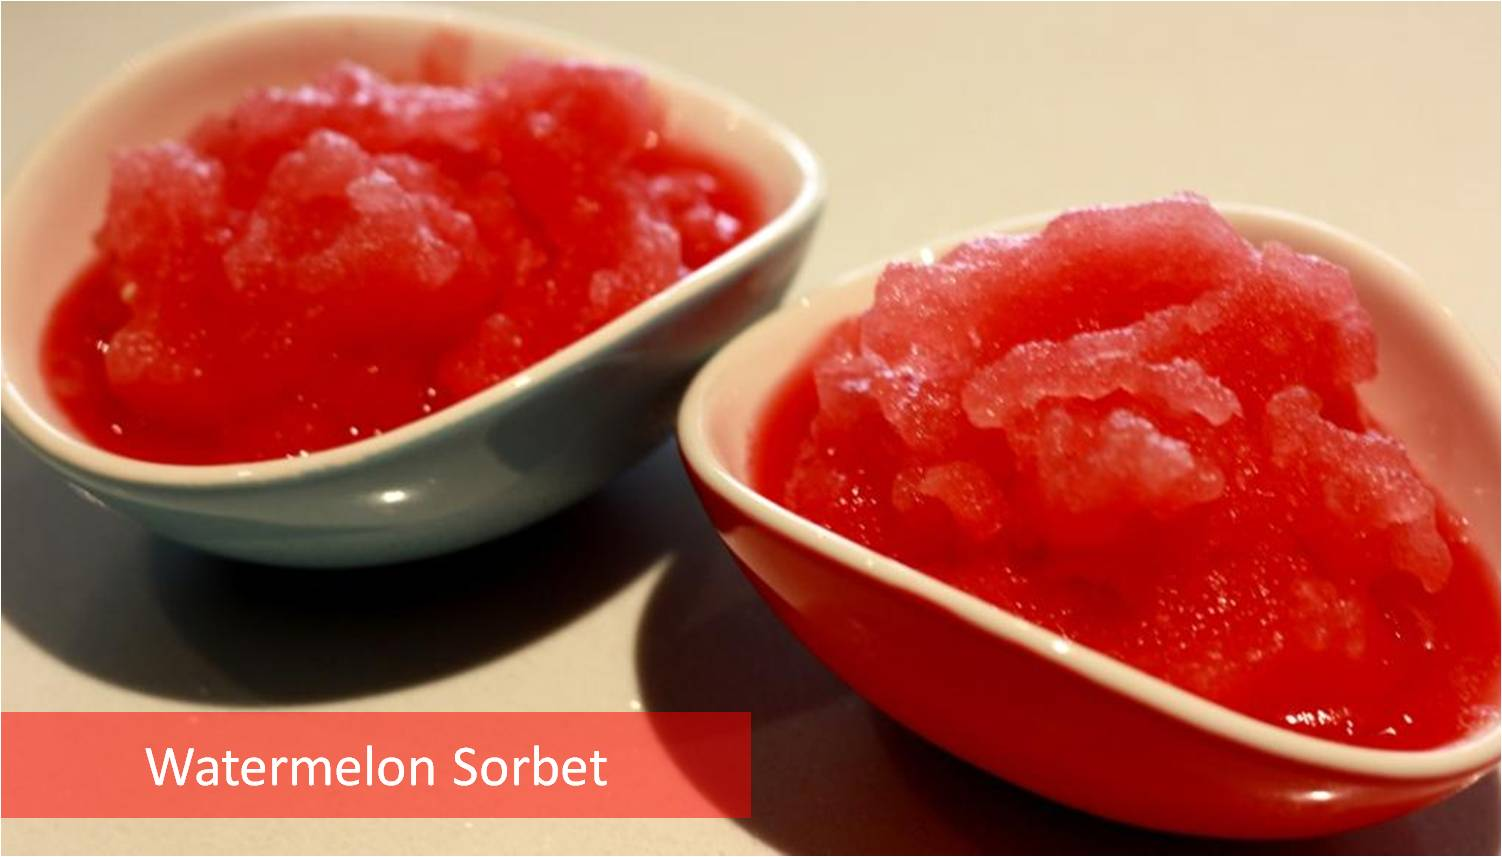 watermelon sorbet recipe my weekend kitchen. Black Bedroom Furniture Sets. Home Design Ideas